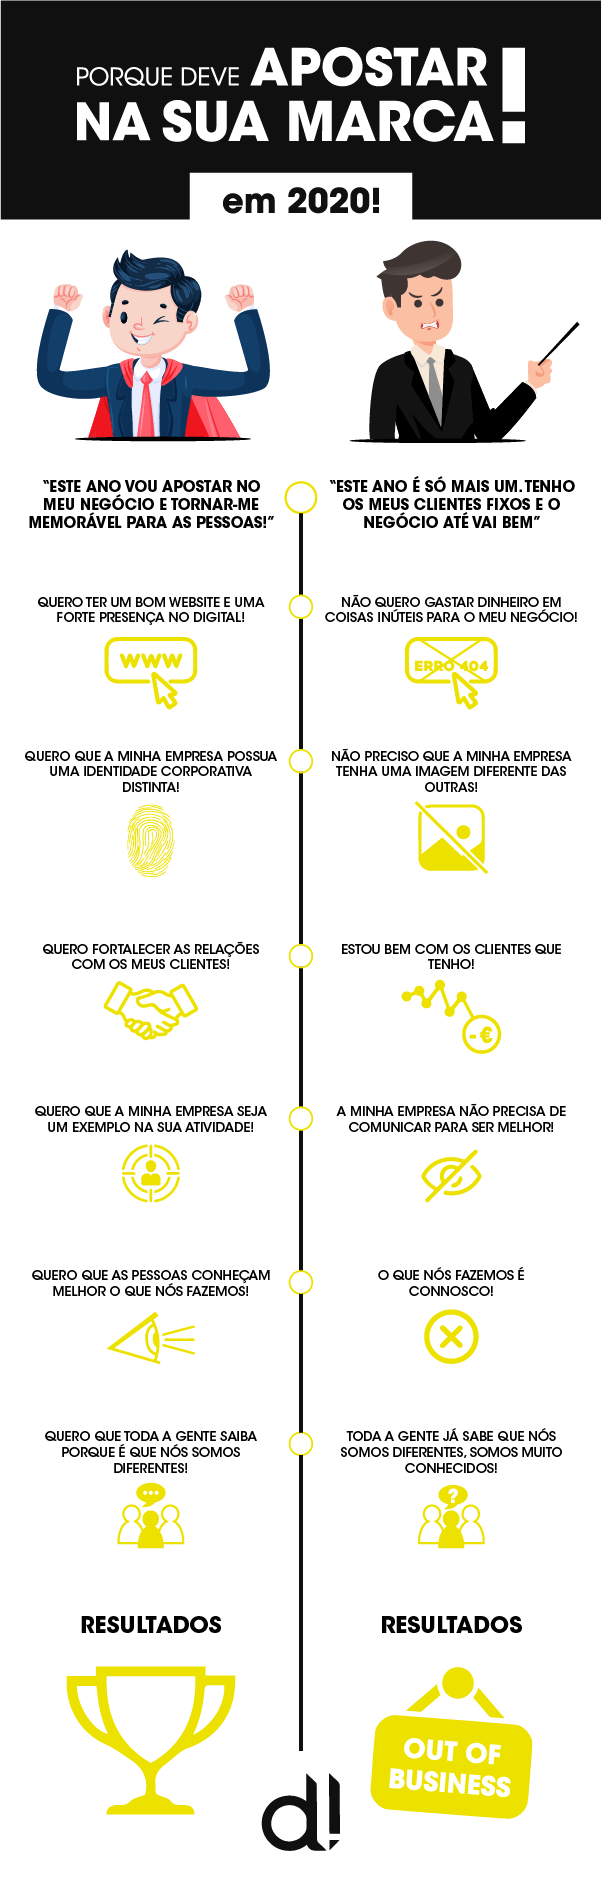 apostar-marca-2020-infográfico-desassossego